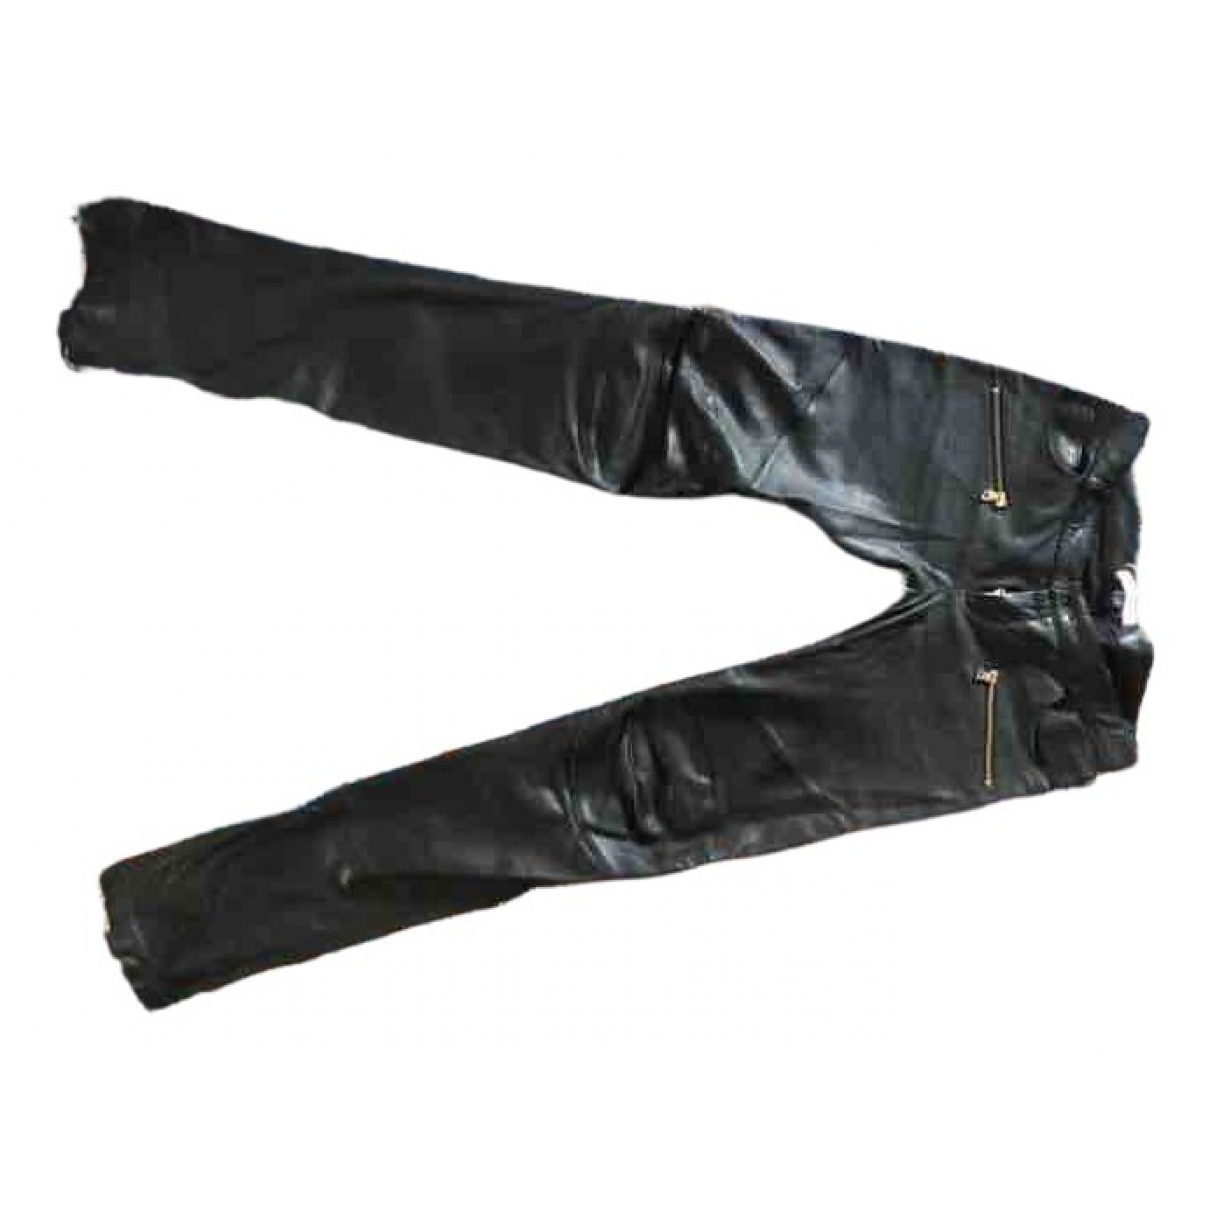 Pierre Balmain N Black Leather Trousers for Women L International